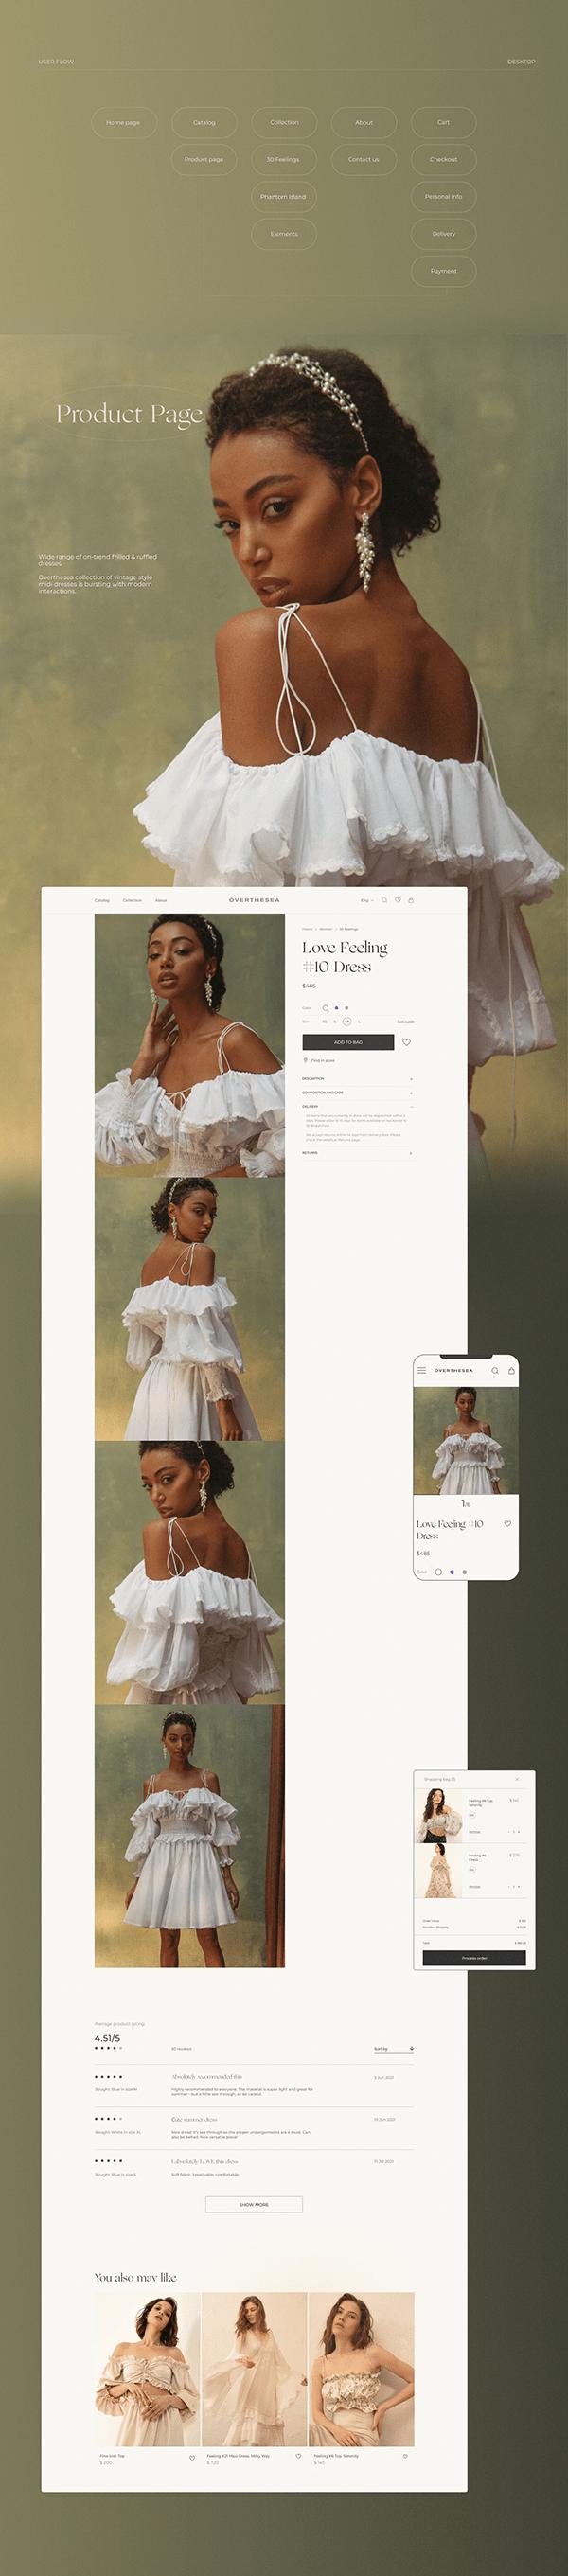 Overthesea — E-commerce